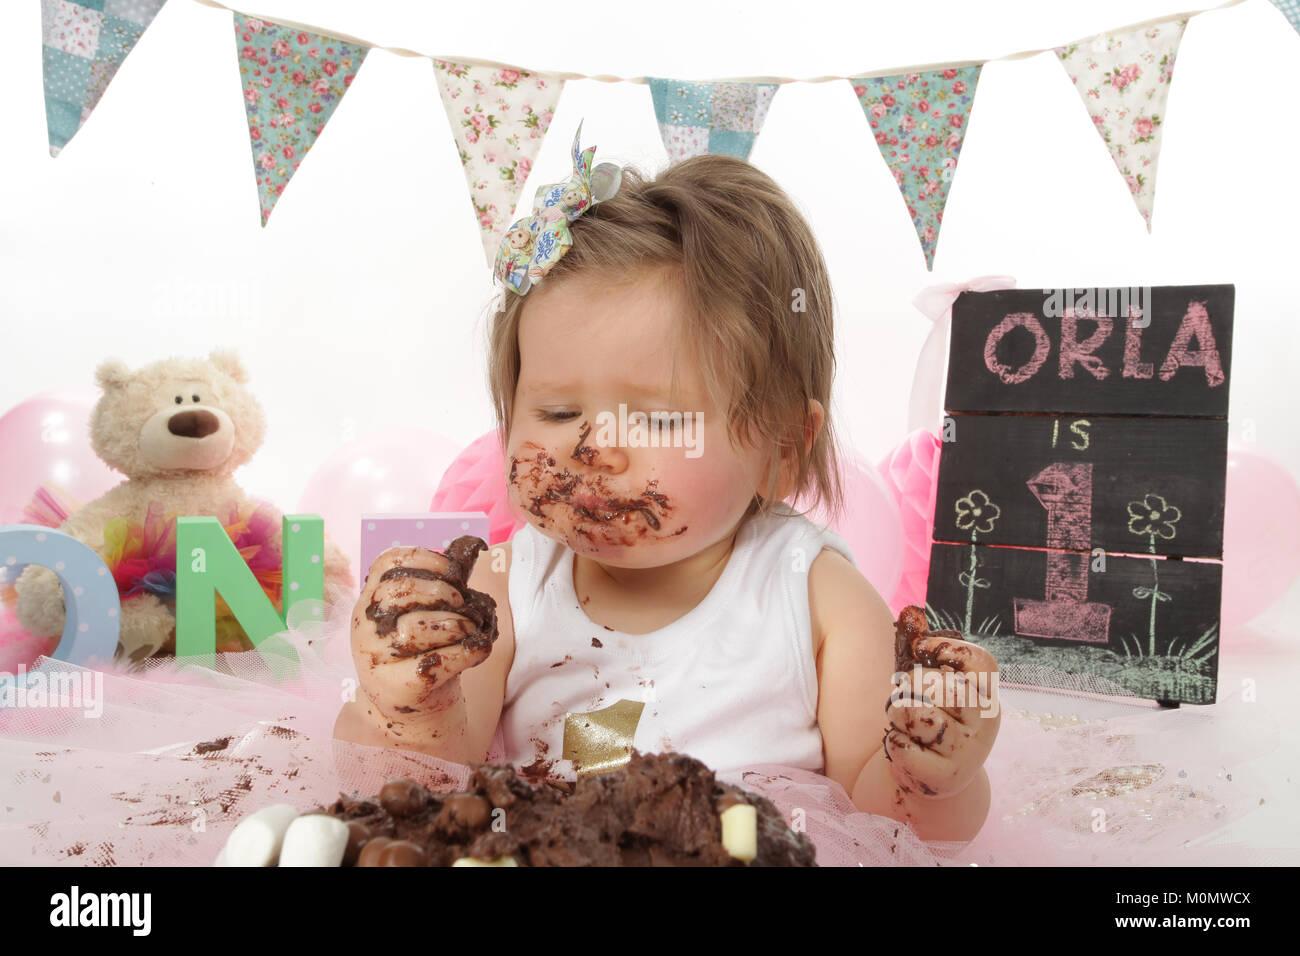 Birthday Girl Cake Face Smash